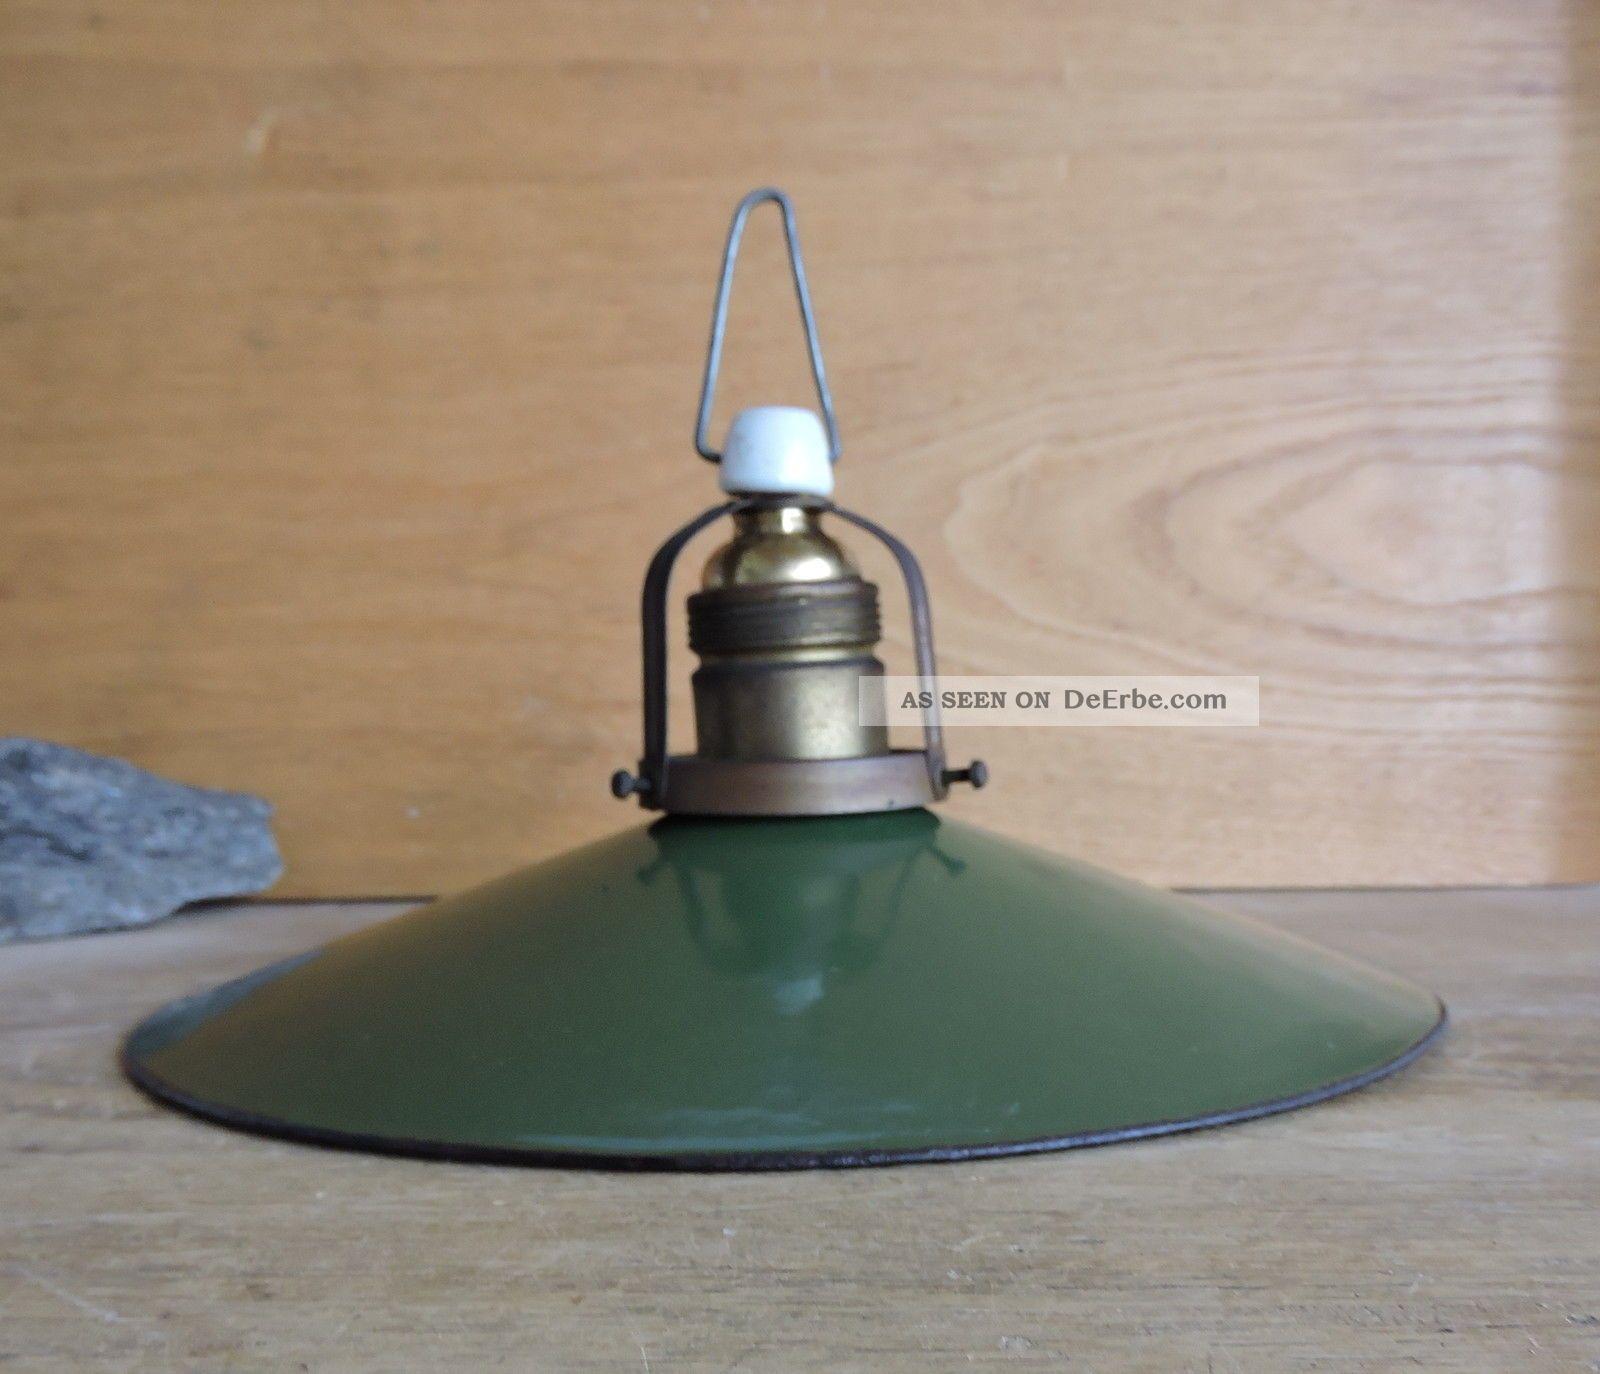 bauhaus art deco lampe deckenlampe emailschirm gr n wei werkst tte industrie. Black Bedroom Furniture Sets. Home Design Ideas